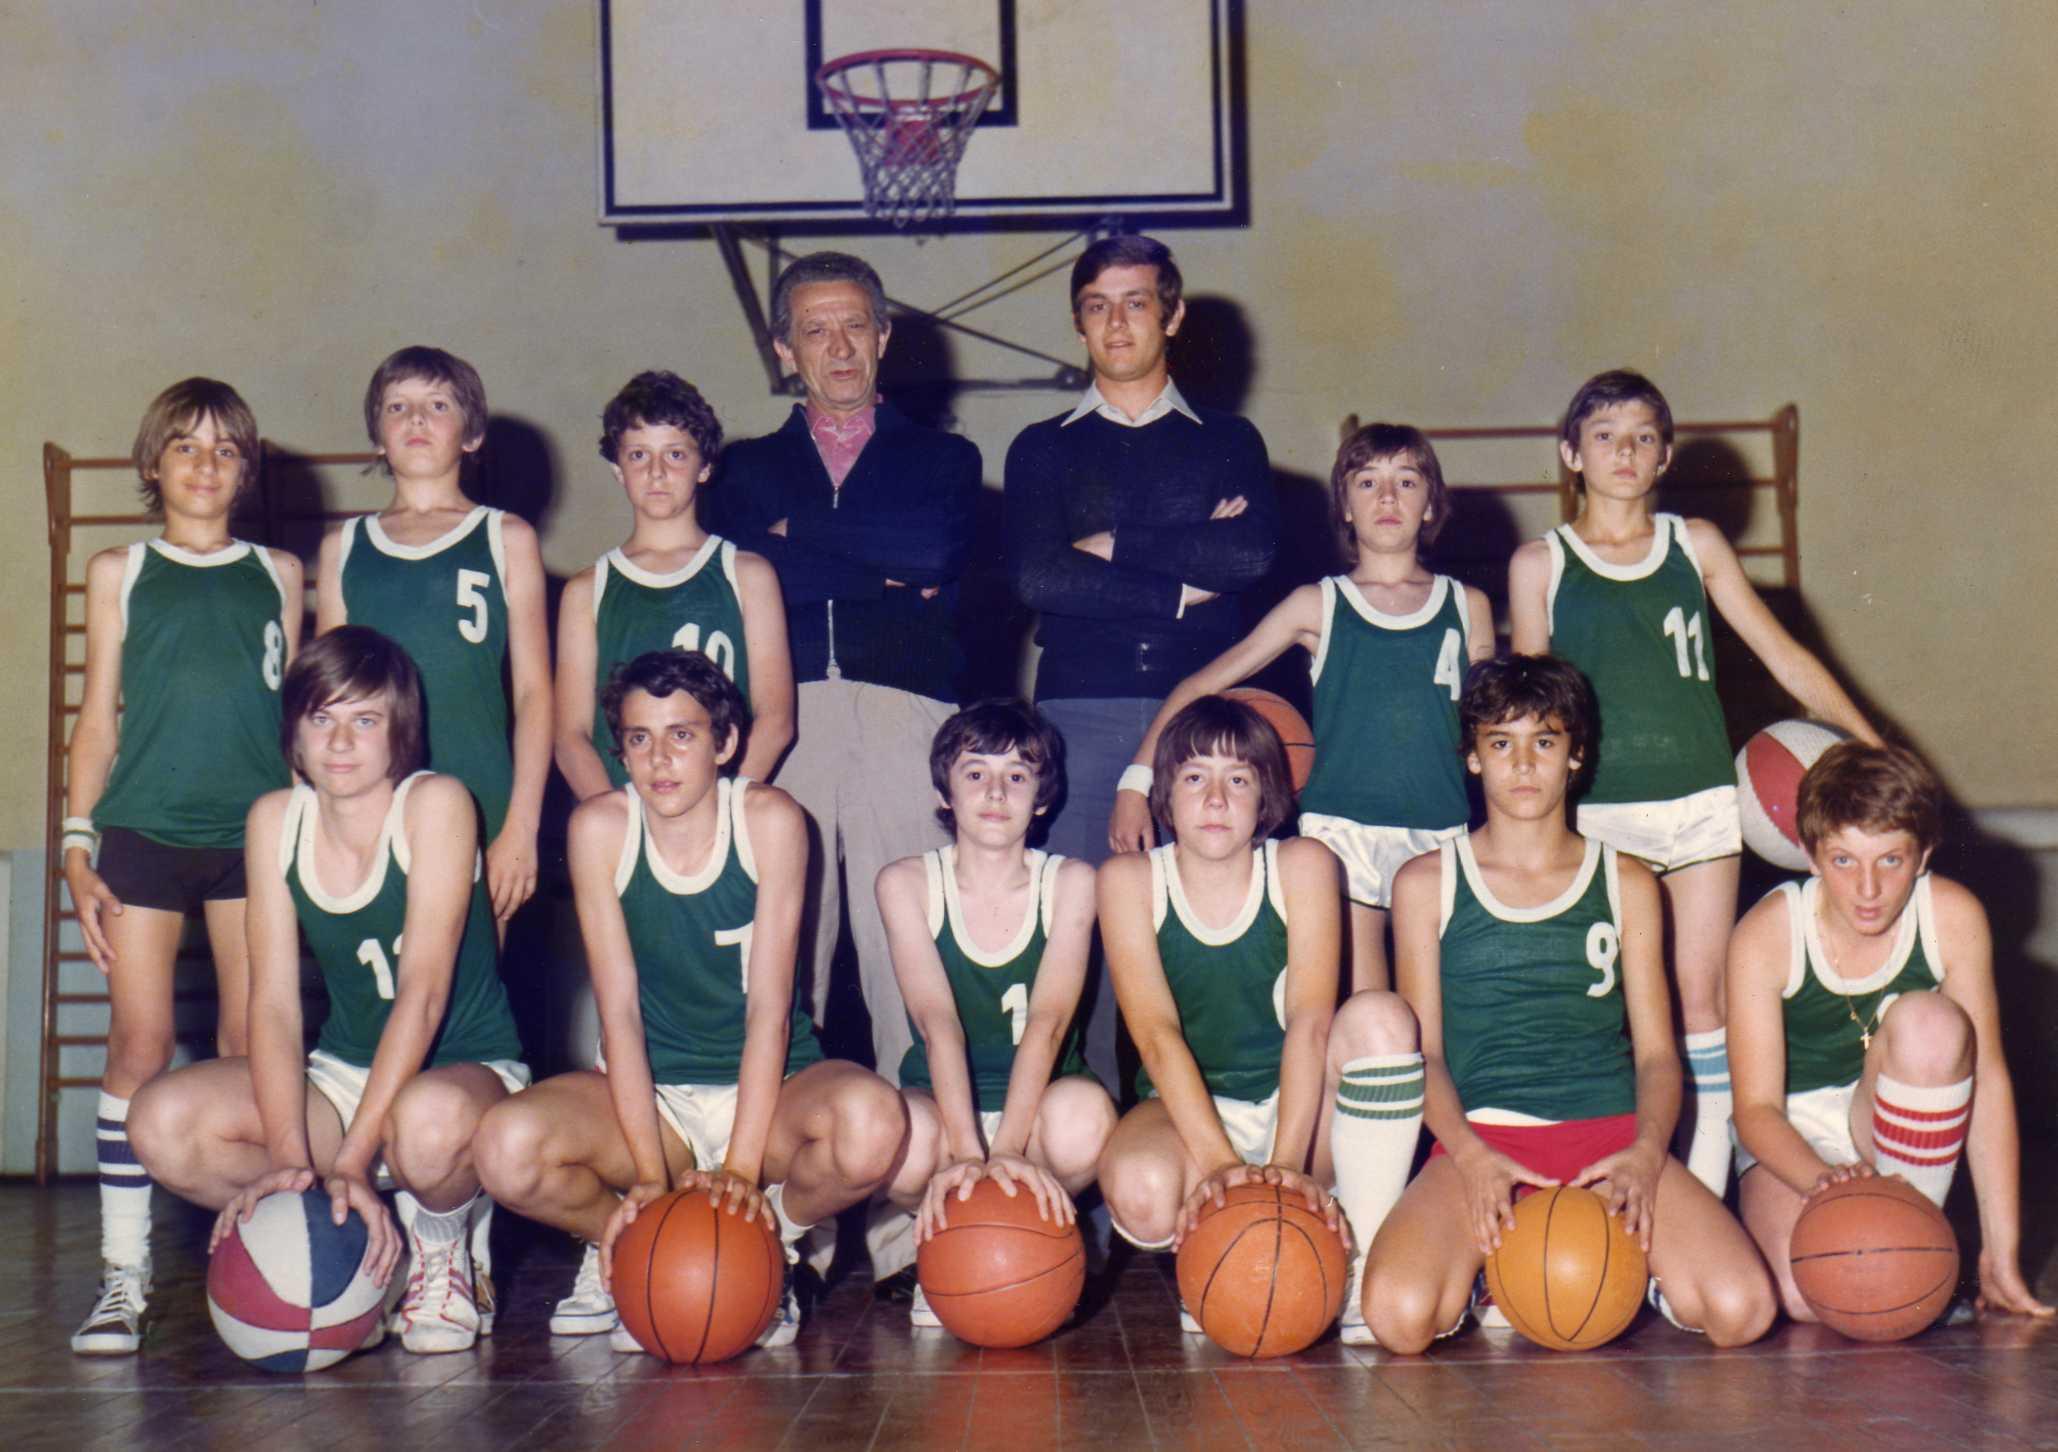 camp-to-ragazzi-1973-1974